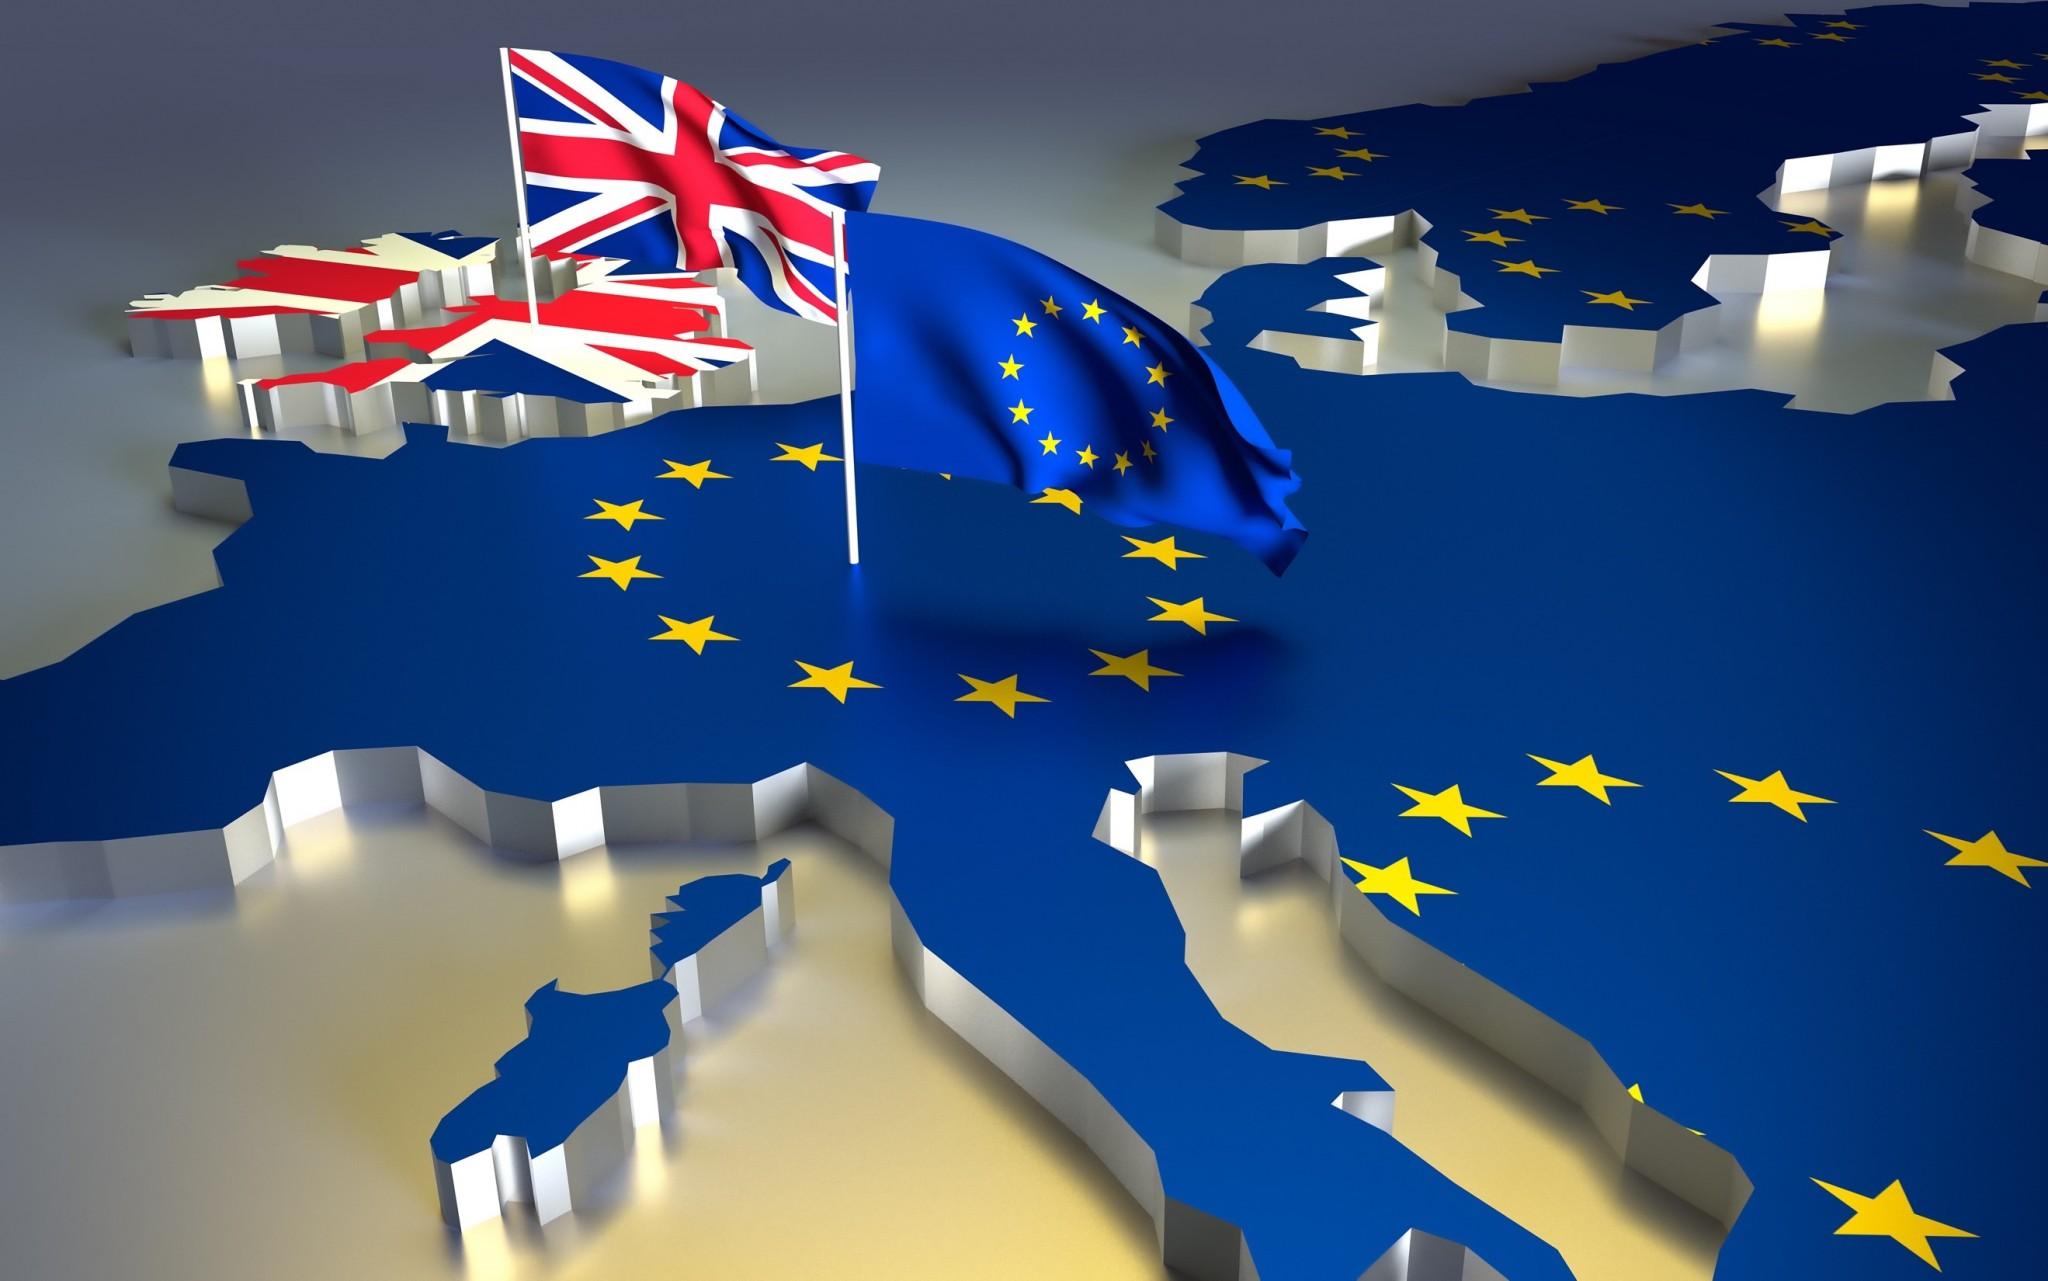 EU picture